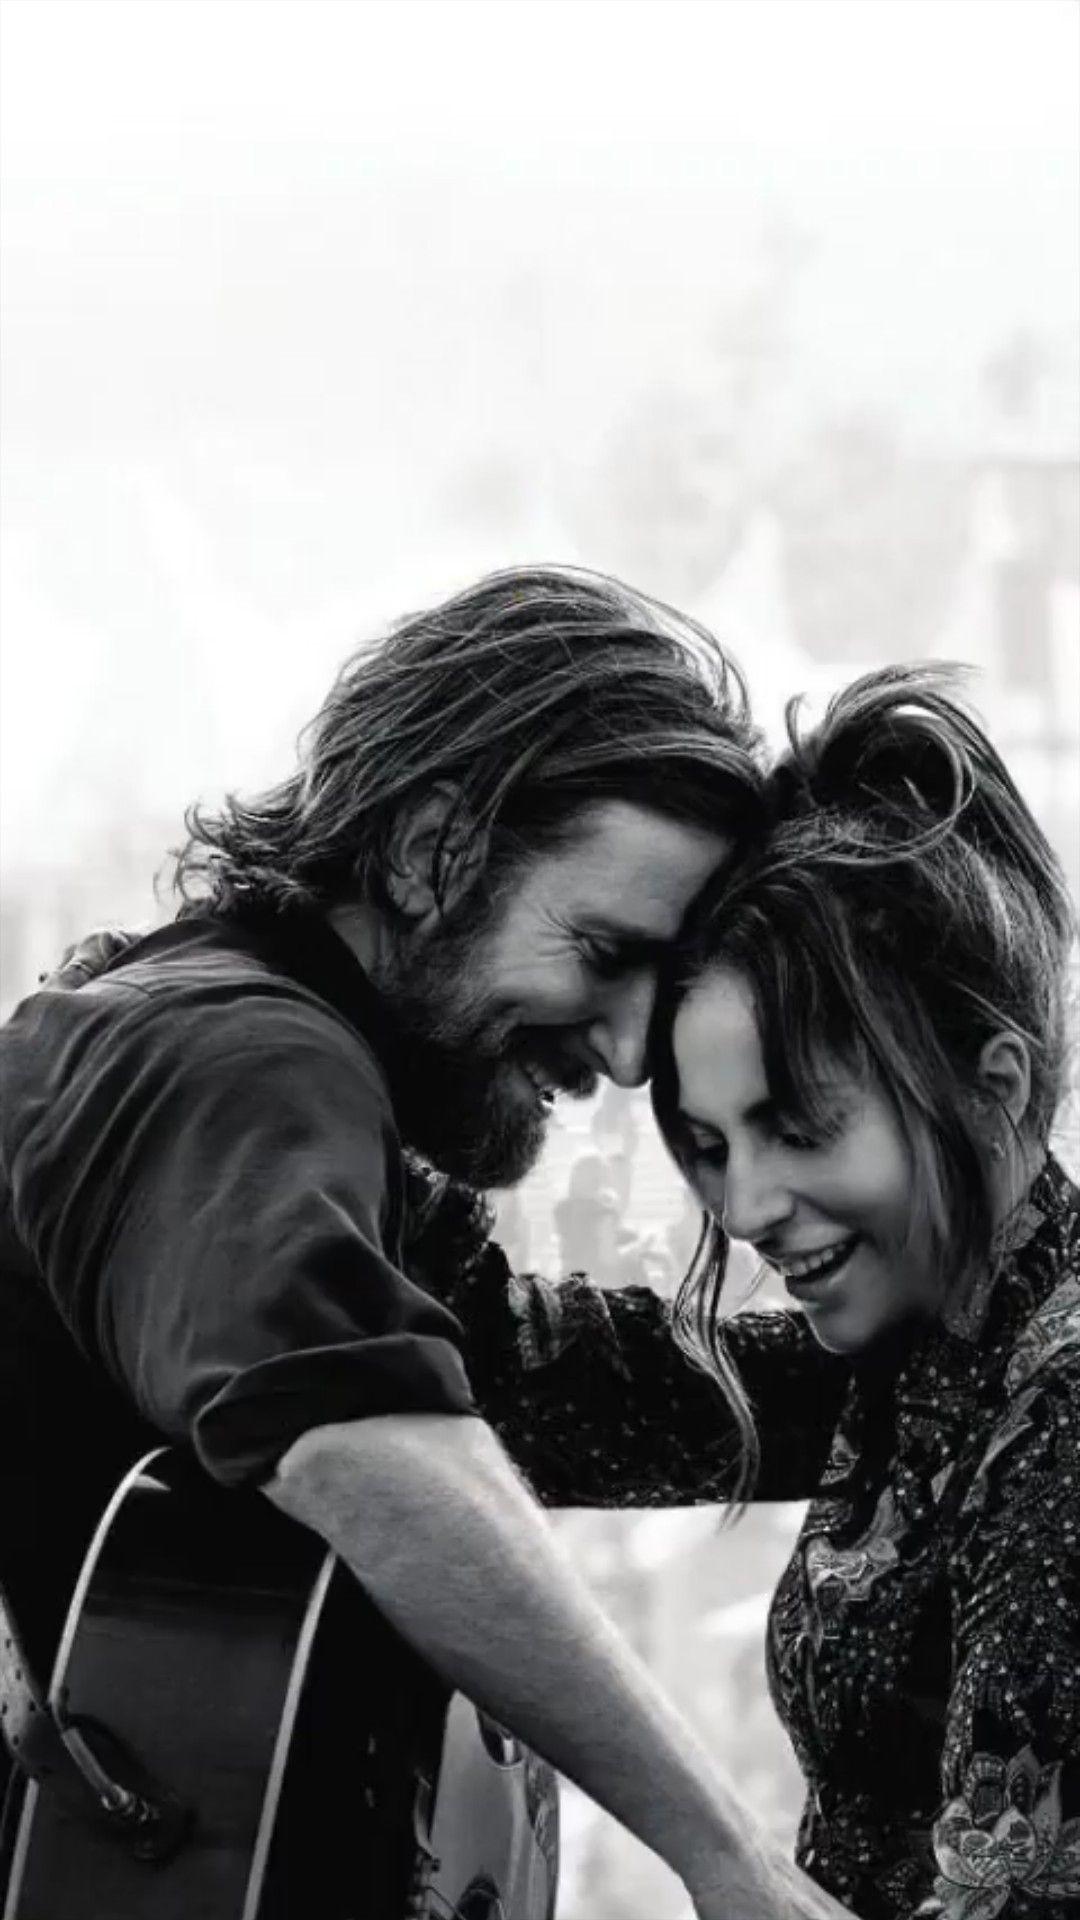 Pin Di Juliette Su Gaguinha Film Romantici Pretty Woman Sfondi